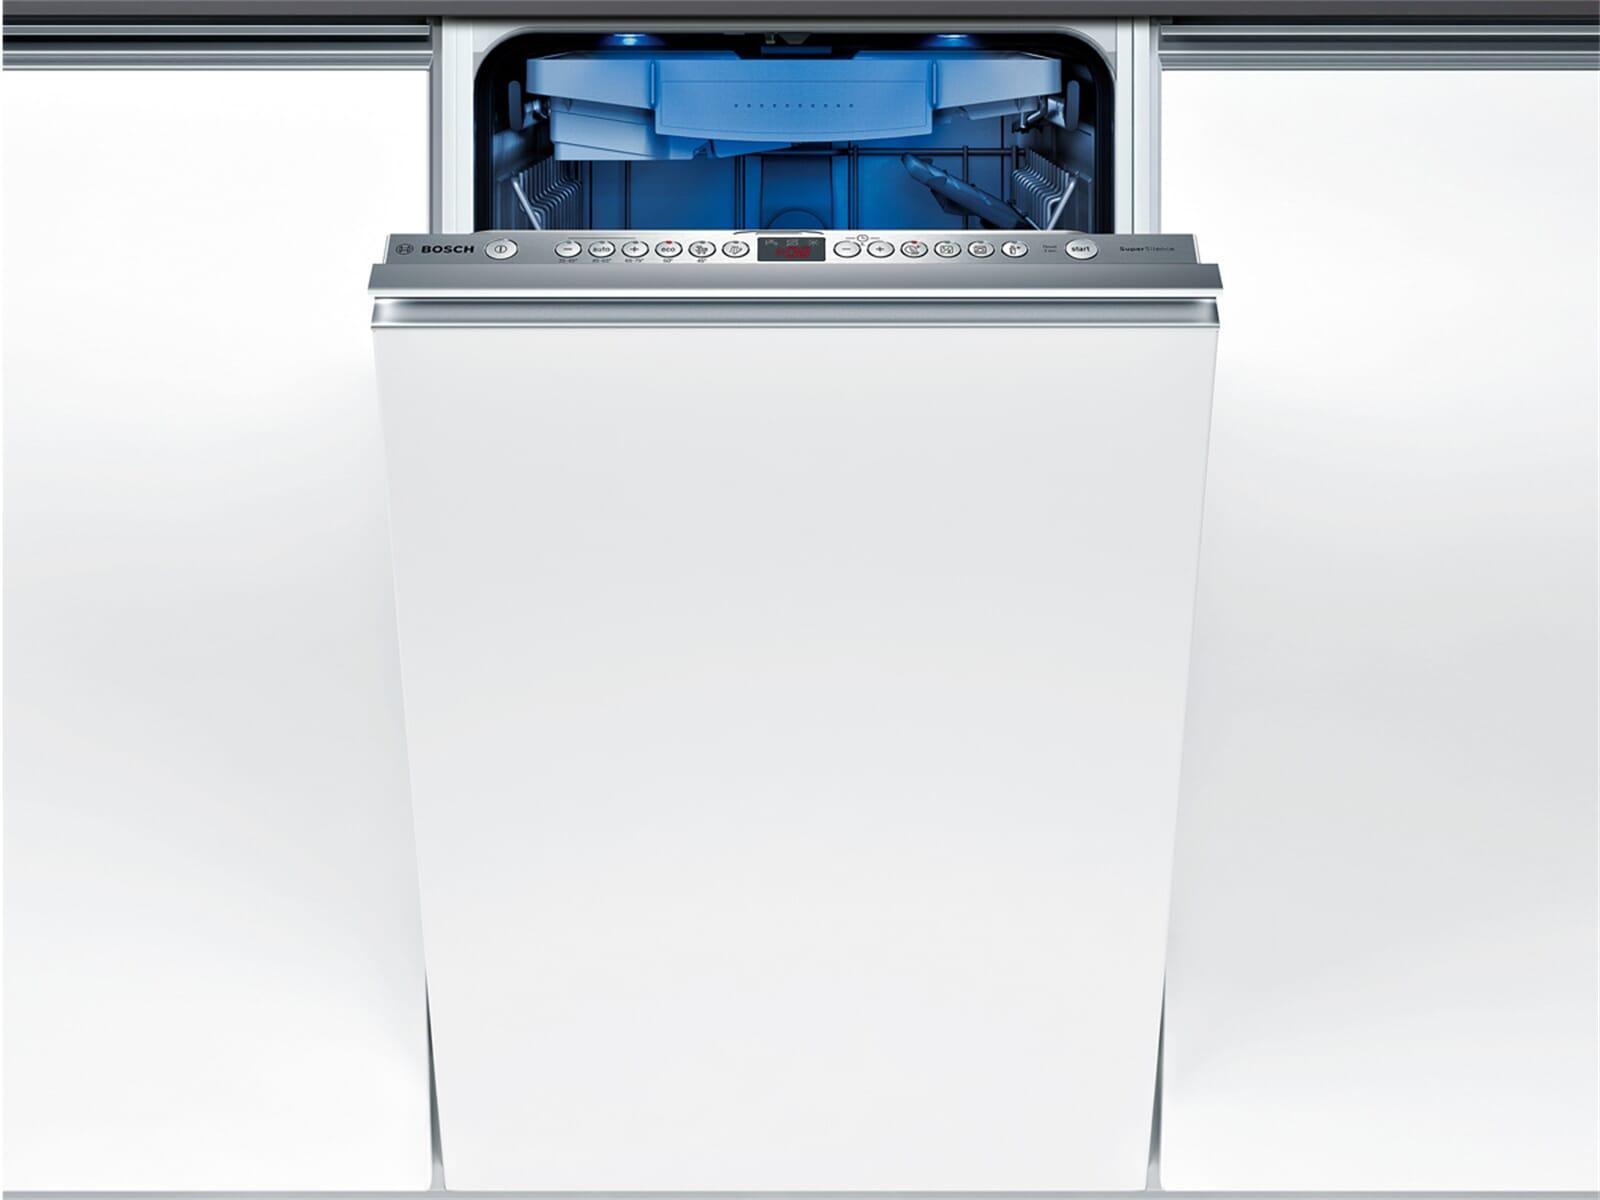 bosch spv69t50eu vollintegriert 45 cm einbau geschirrsp ler sp lmaschine sp ler ebay. Black Bedroom Furniture Sets. Home Design Ideas